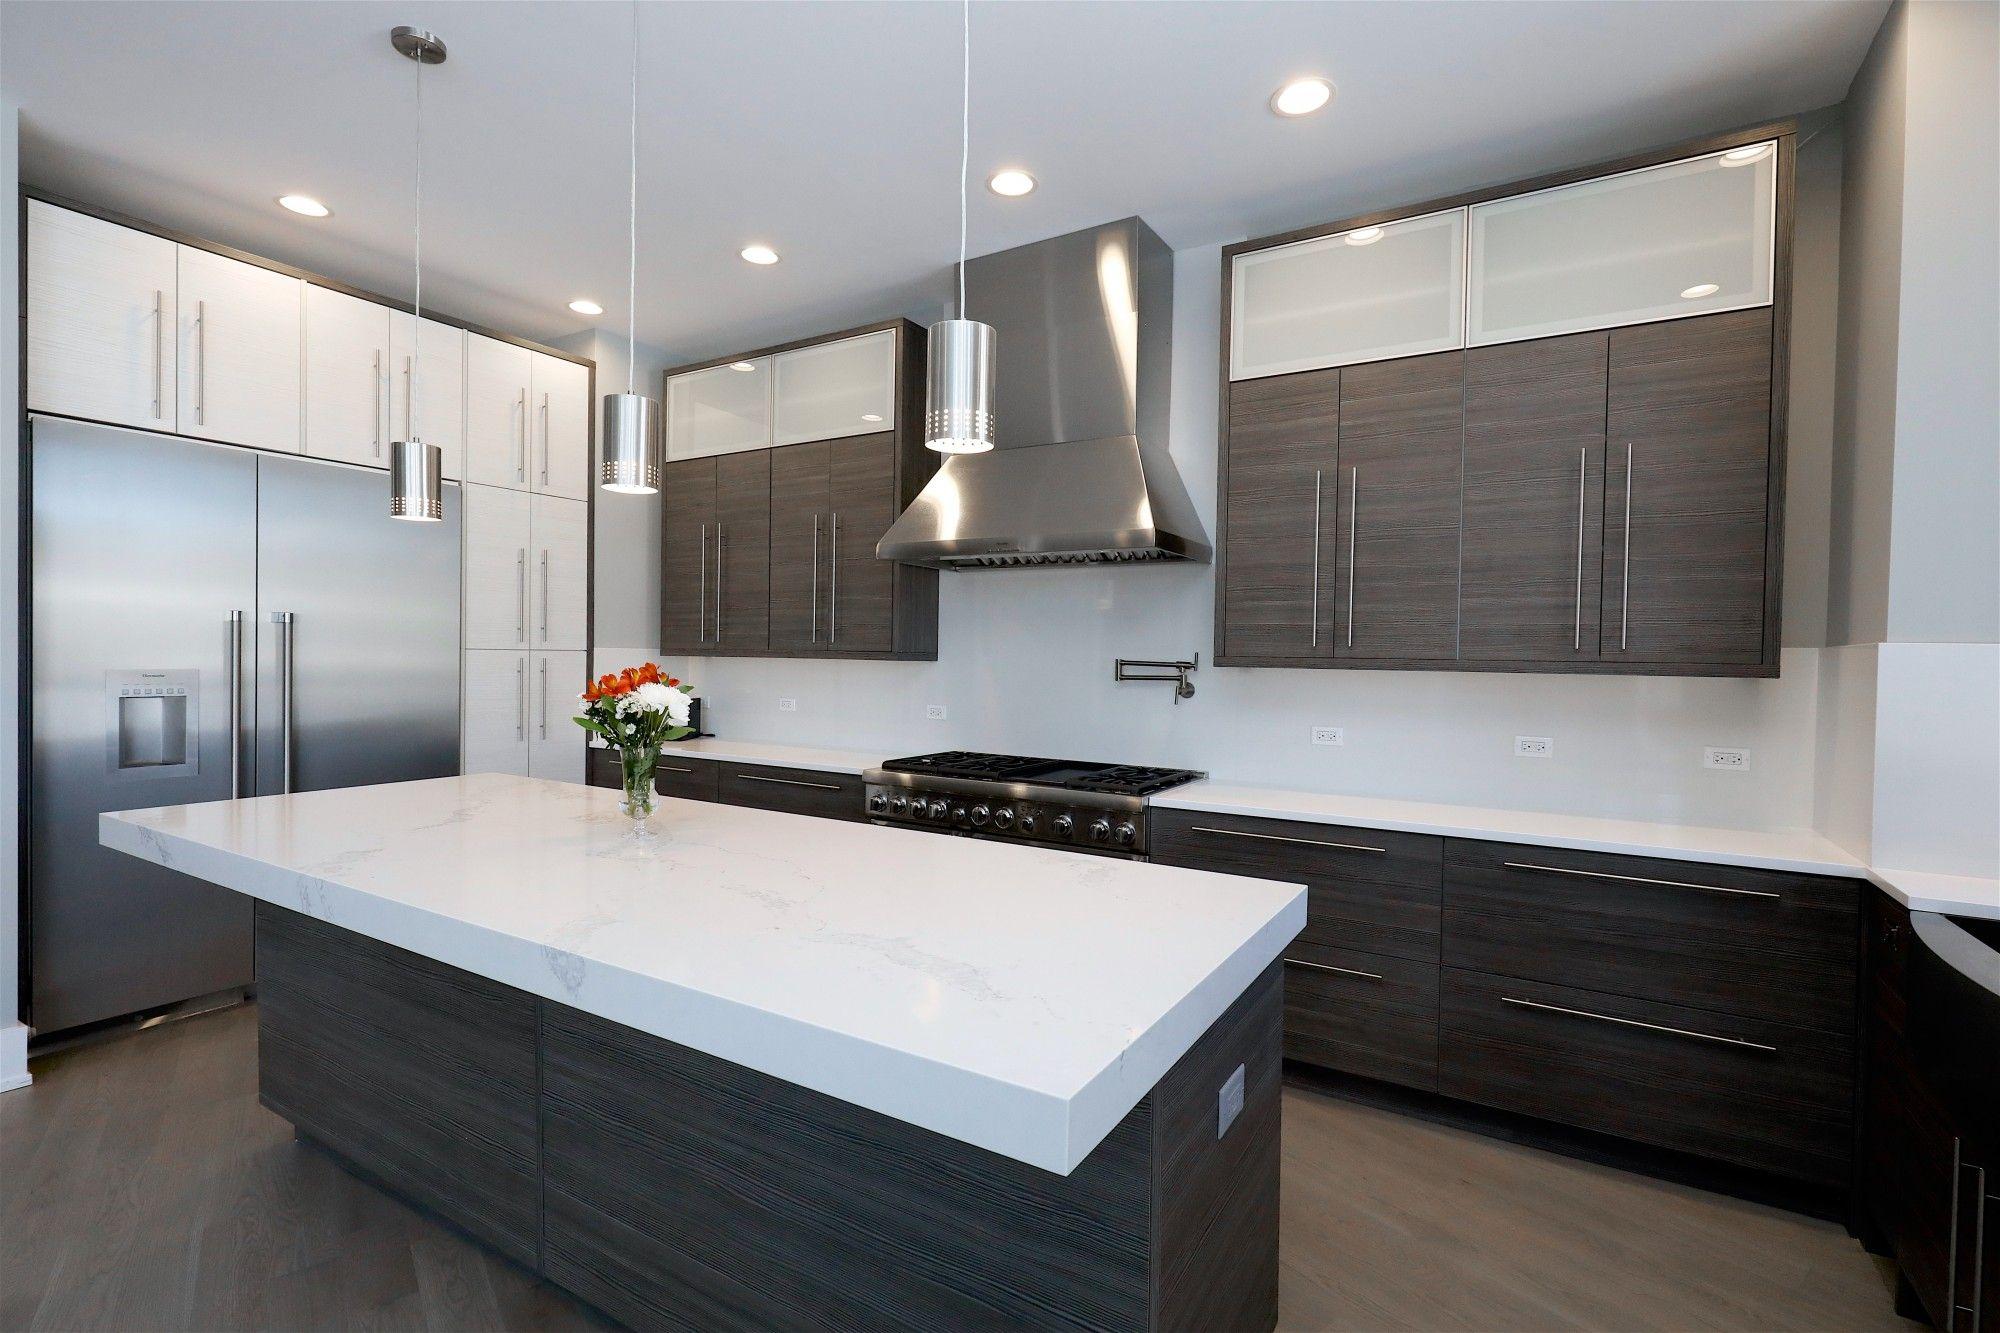 Nessa Lava Kitchen Melamine Stock Cabinets Kitchen Kitchen And Bath Kitchen Cabinets